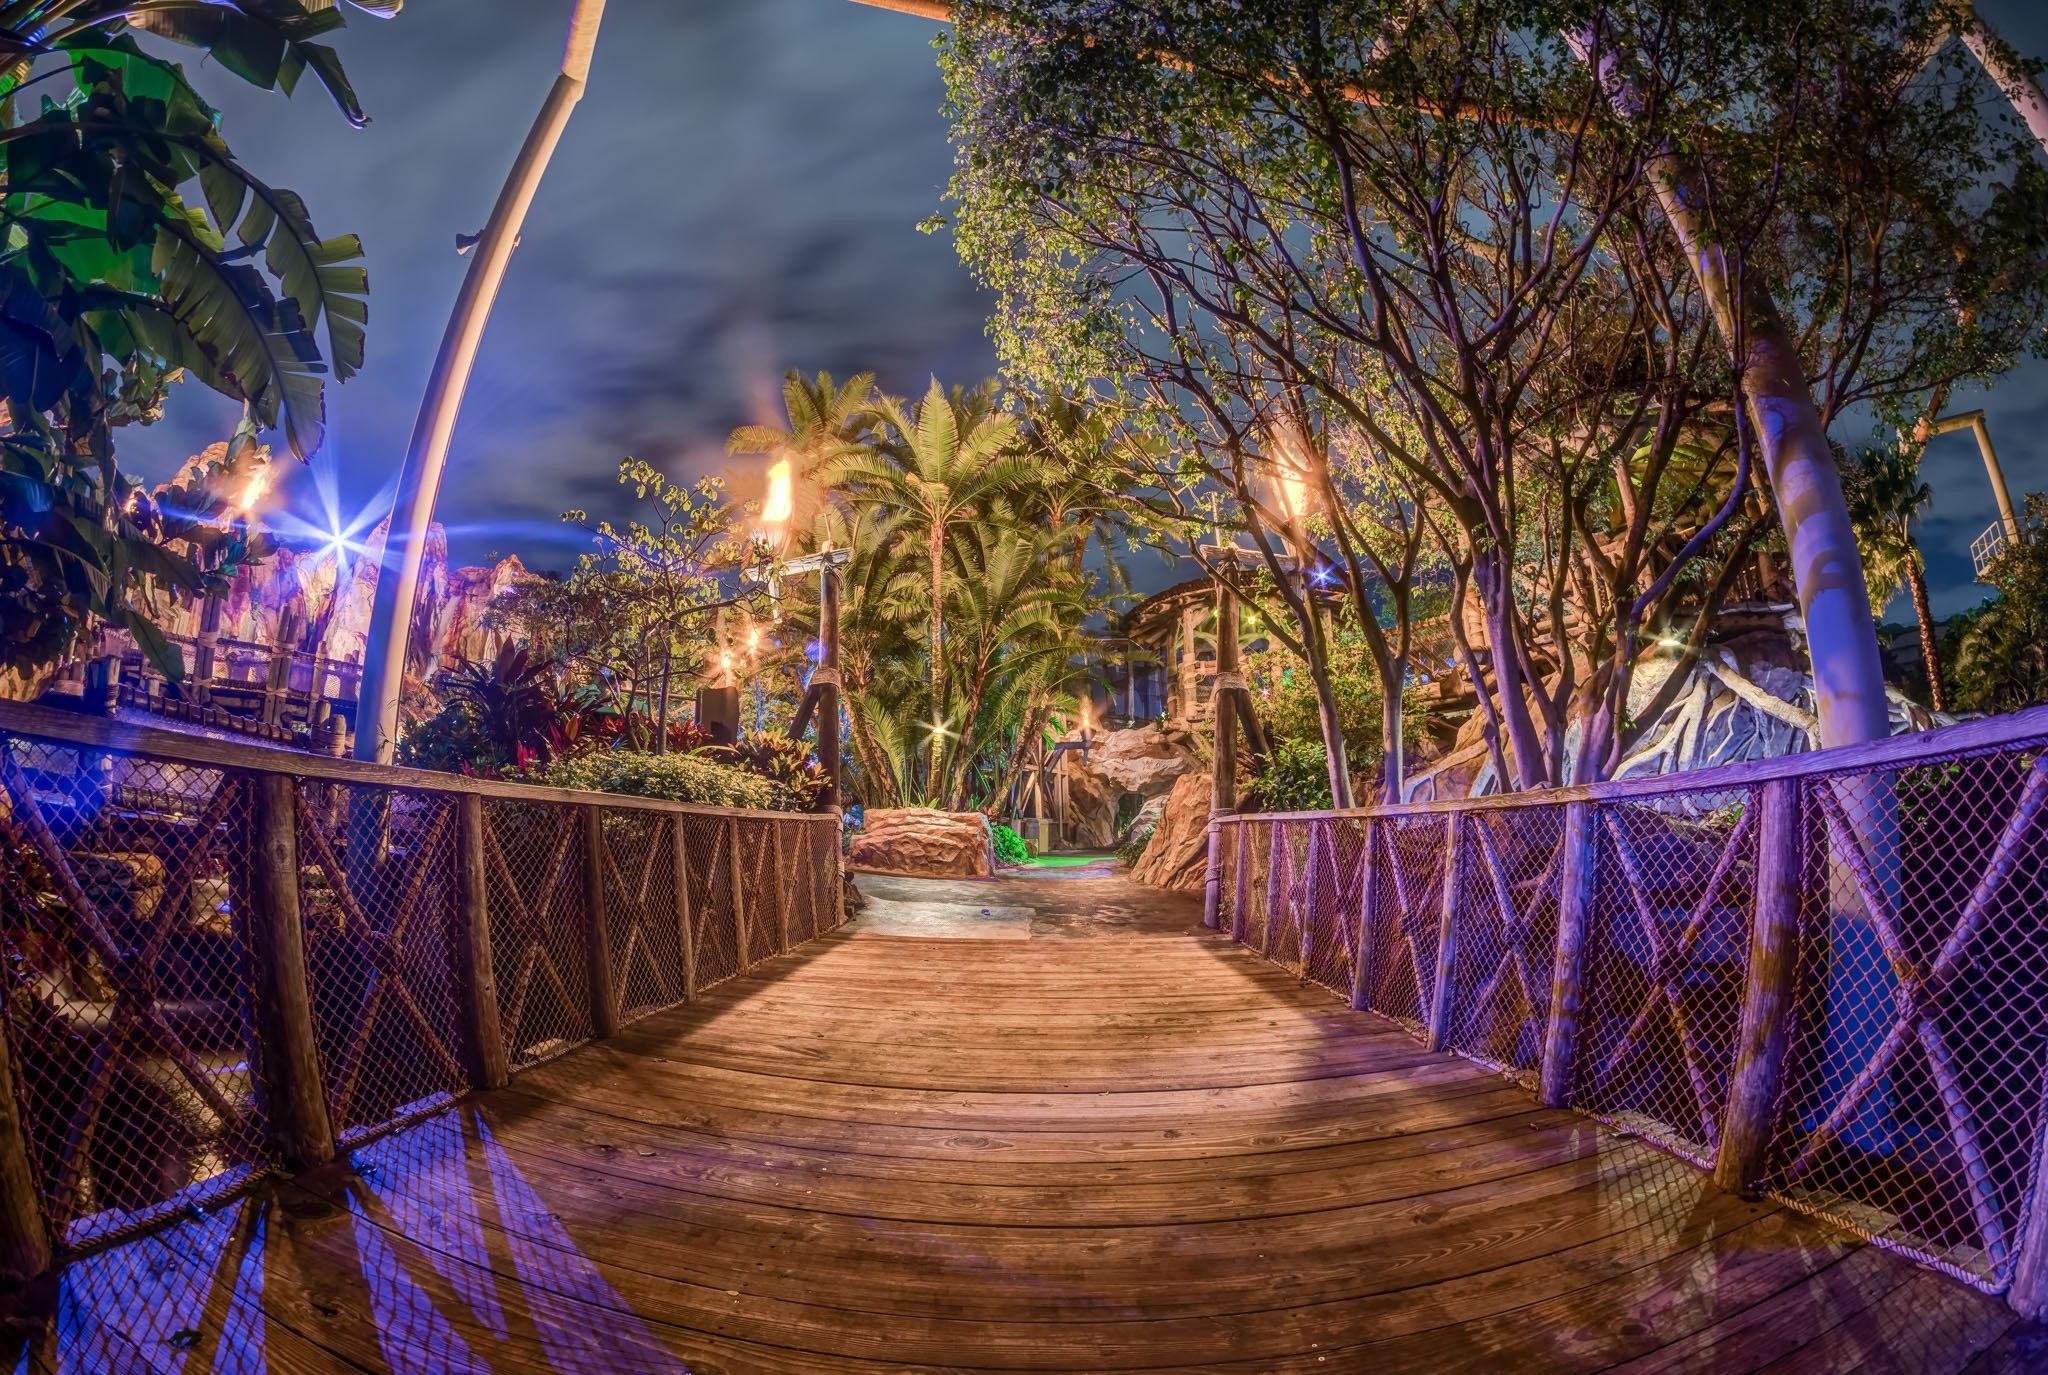 6 astonishing photos of Jurassic Park at night